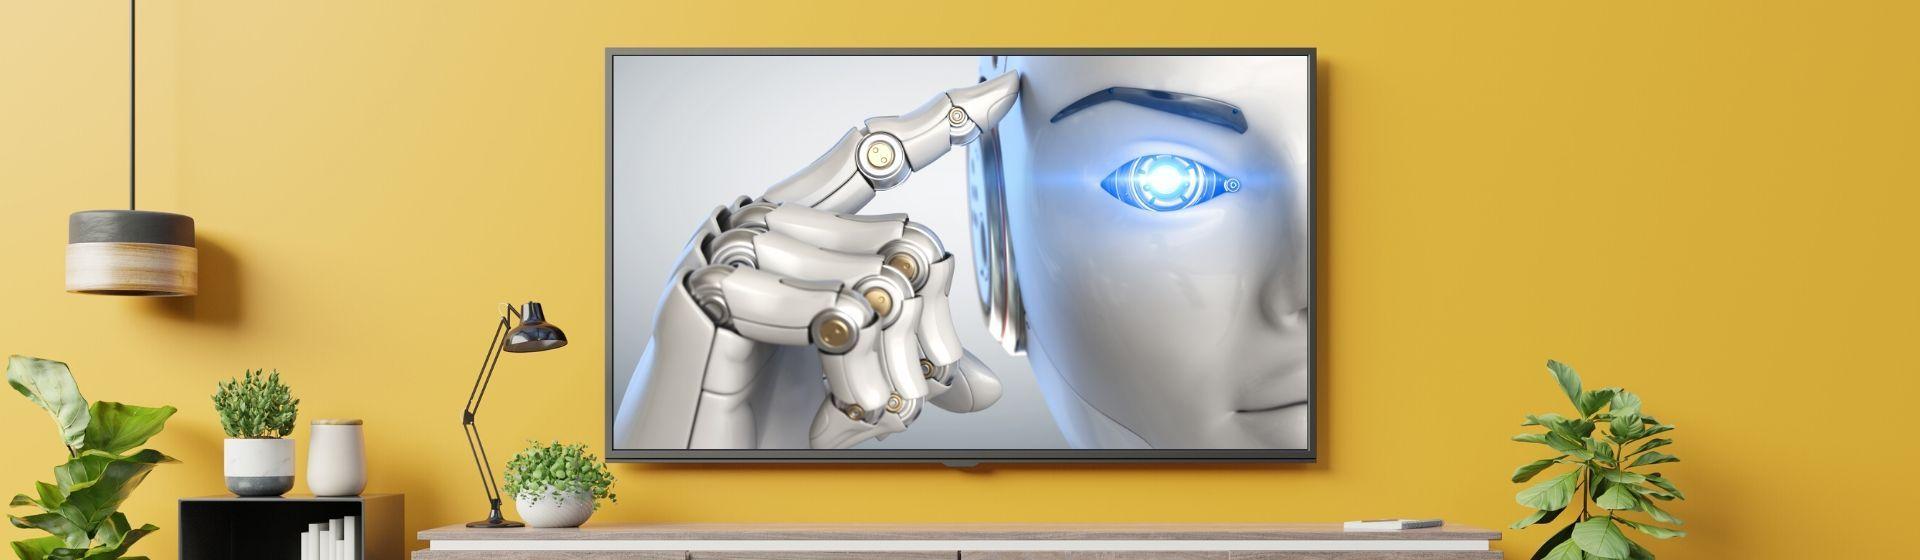 O que é Inteligência Artificial e como ela funciona nas smart TVs